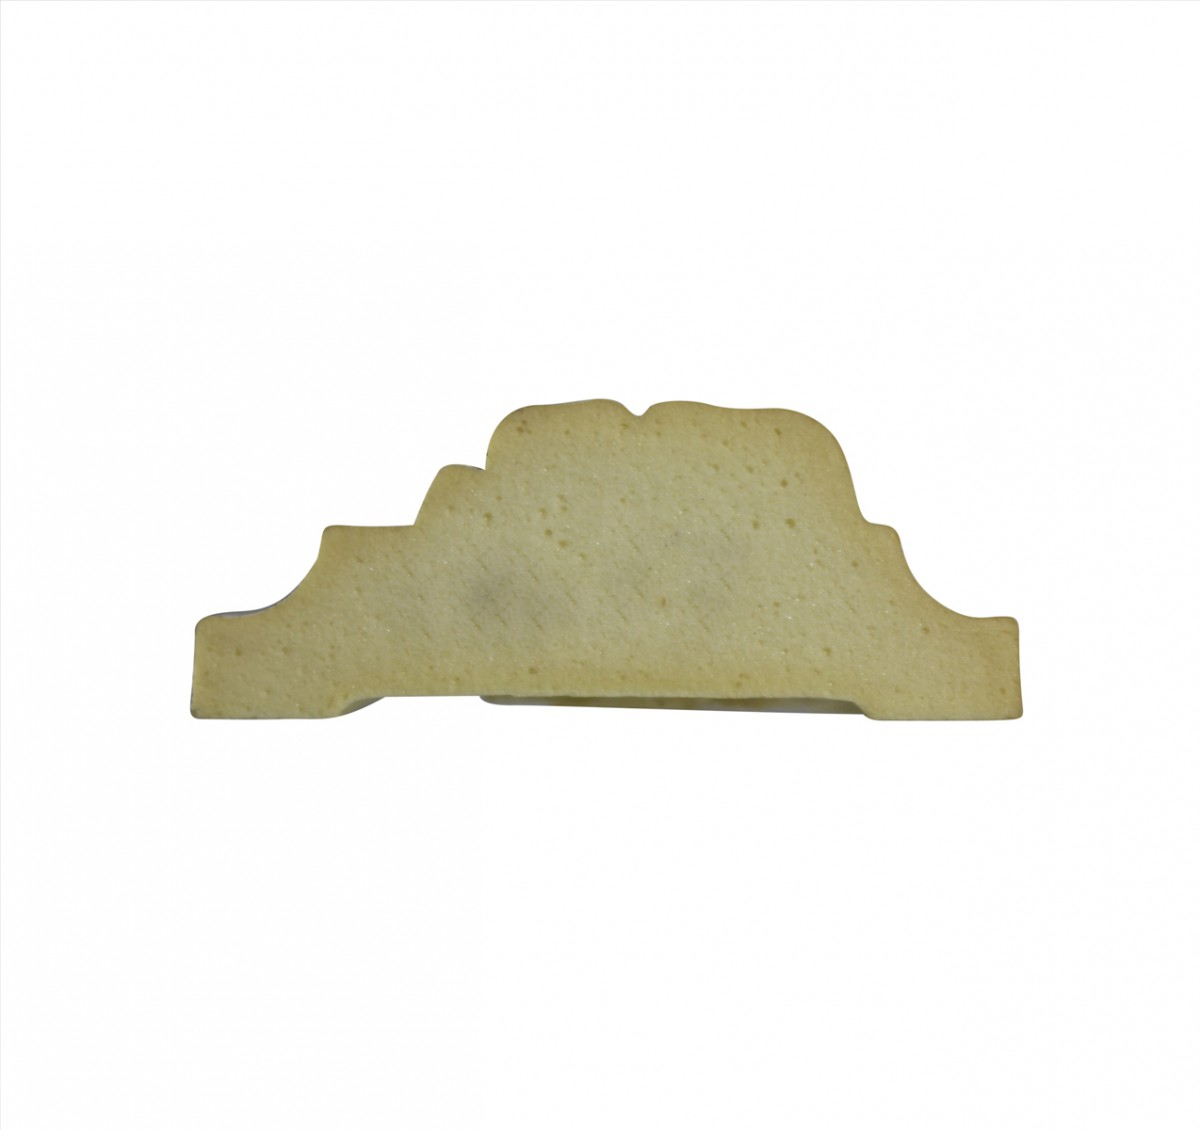 Cornice White Urethane 23.5 Sample of 11675 Cornice Cornice Moulding Cornice Molding